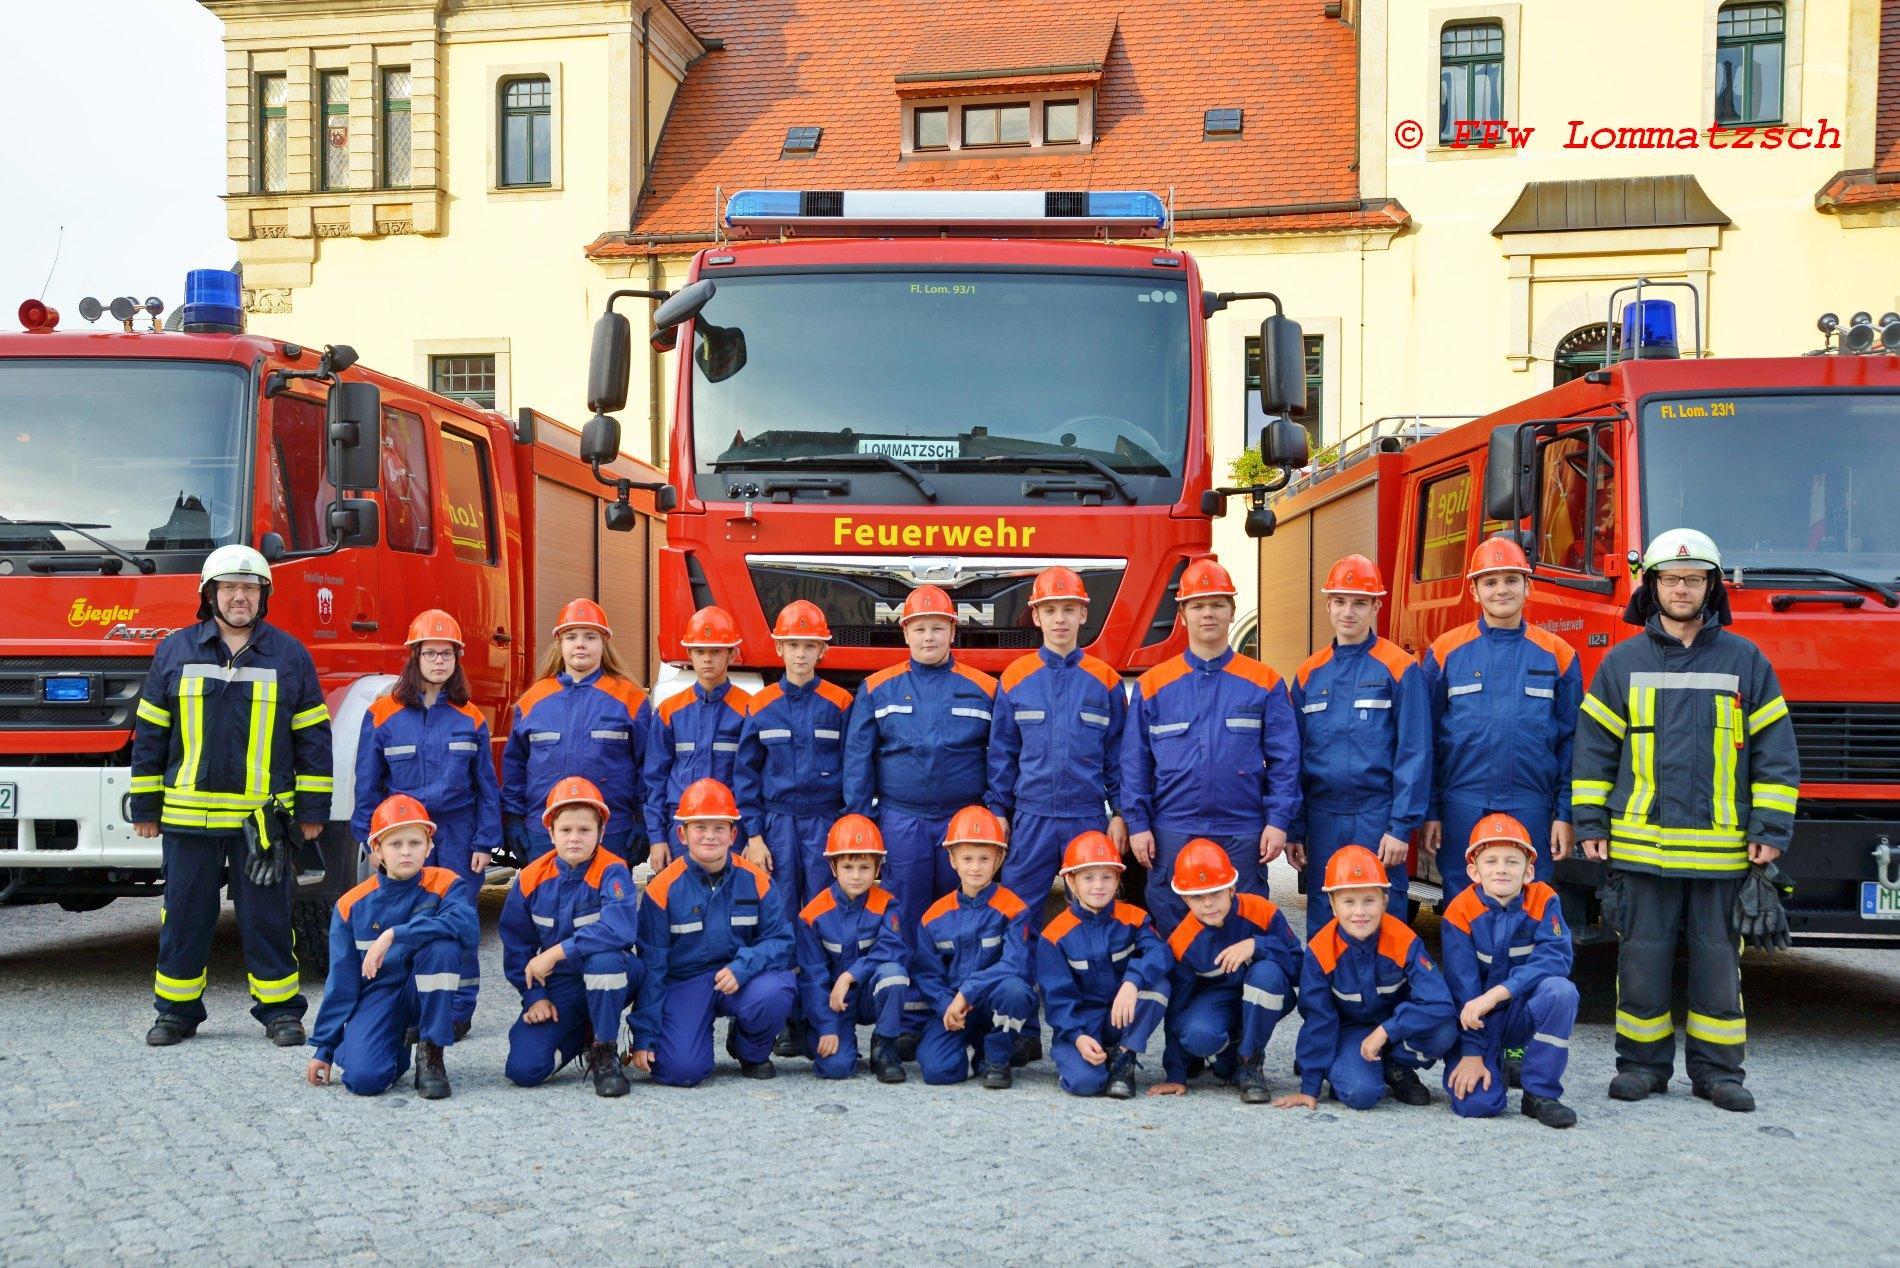 Mannschaft Kinder-/Jugendfeuerwehr Lommatzsch 2020